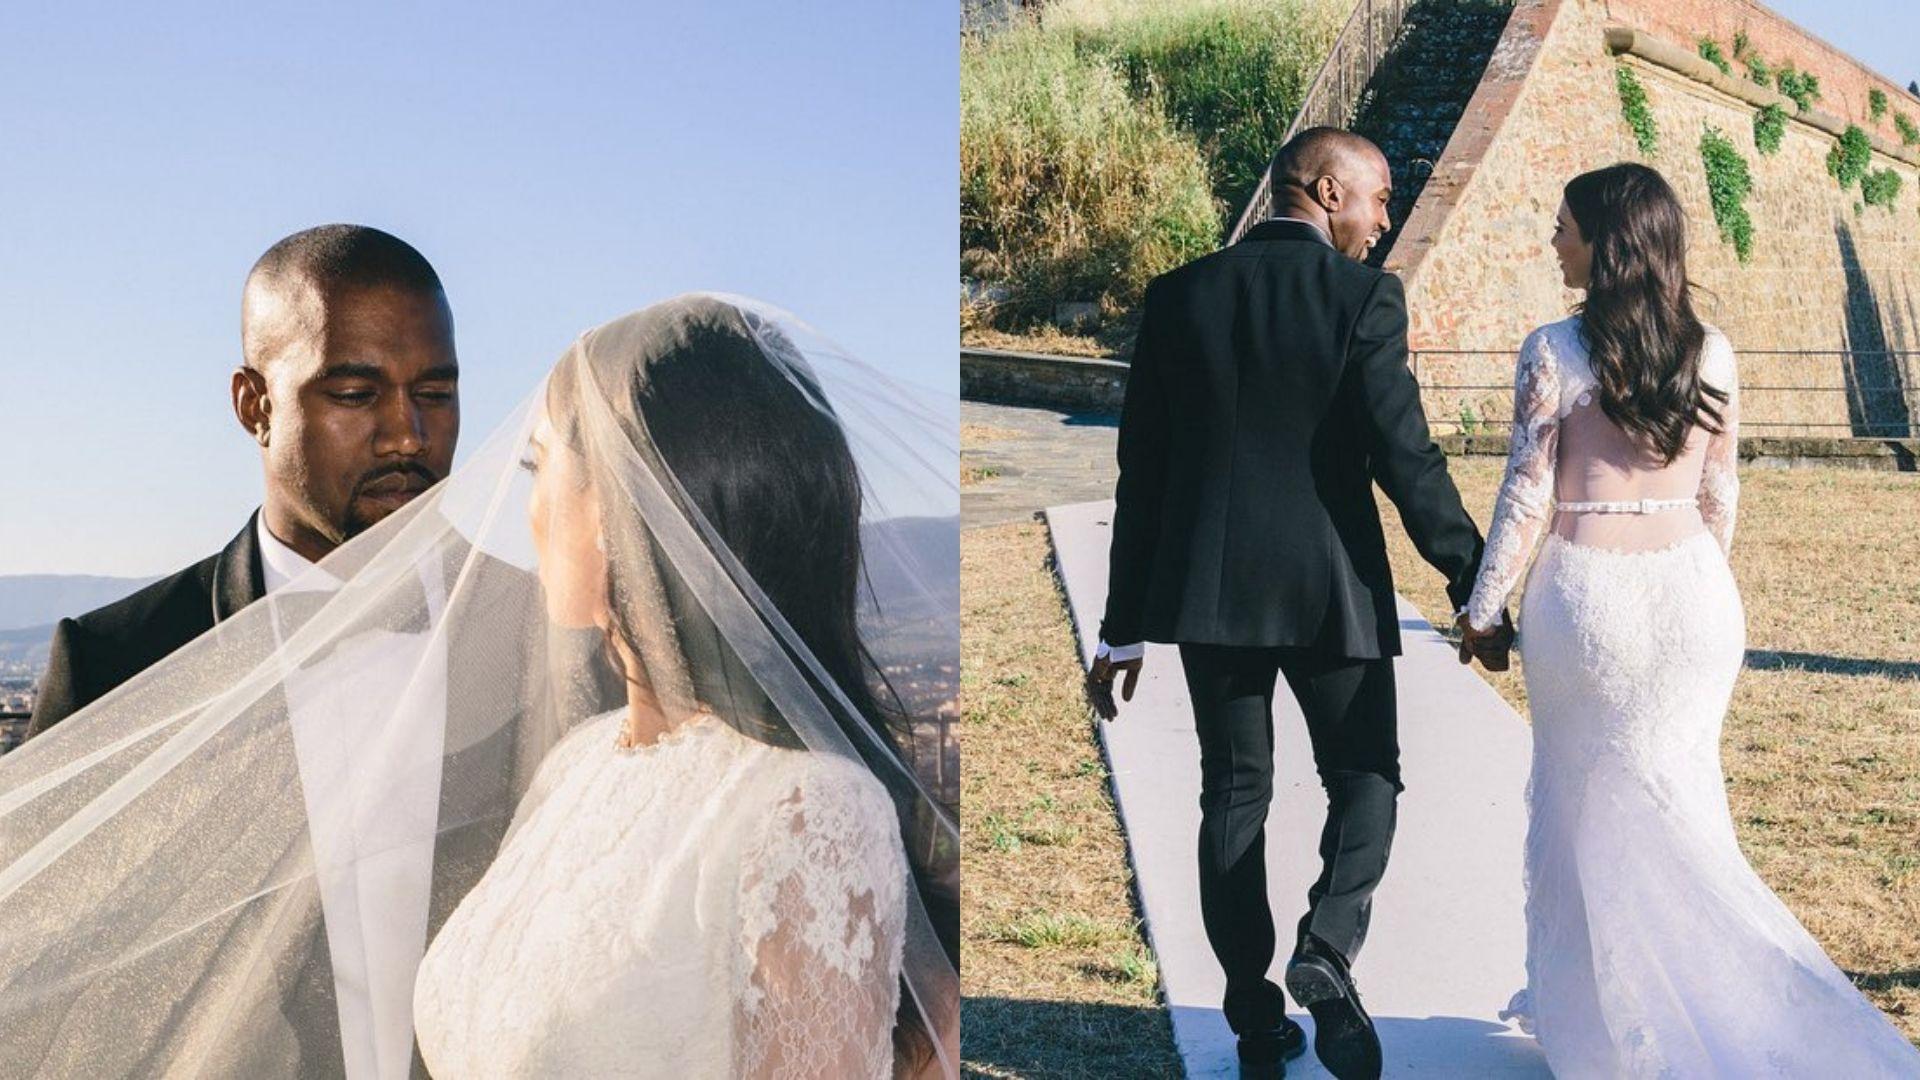 Kim Kardashian And Kanye West Just Renewed Their Wedding Vows In Secret Harper S Bazaar Arabia